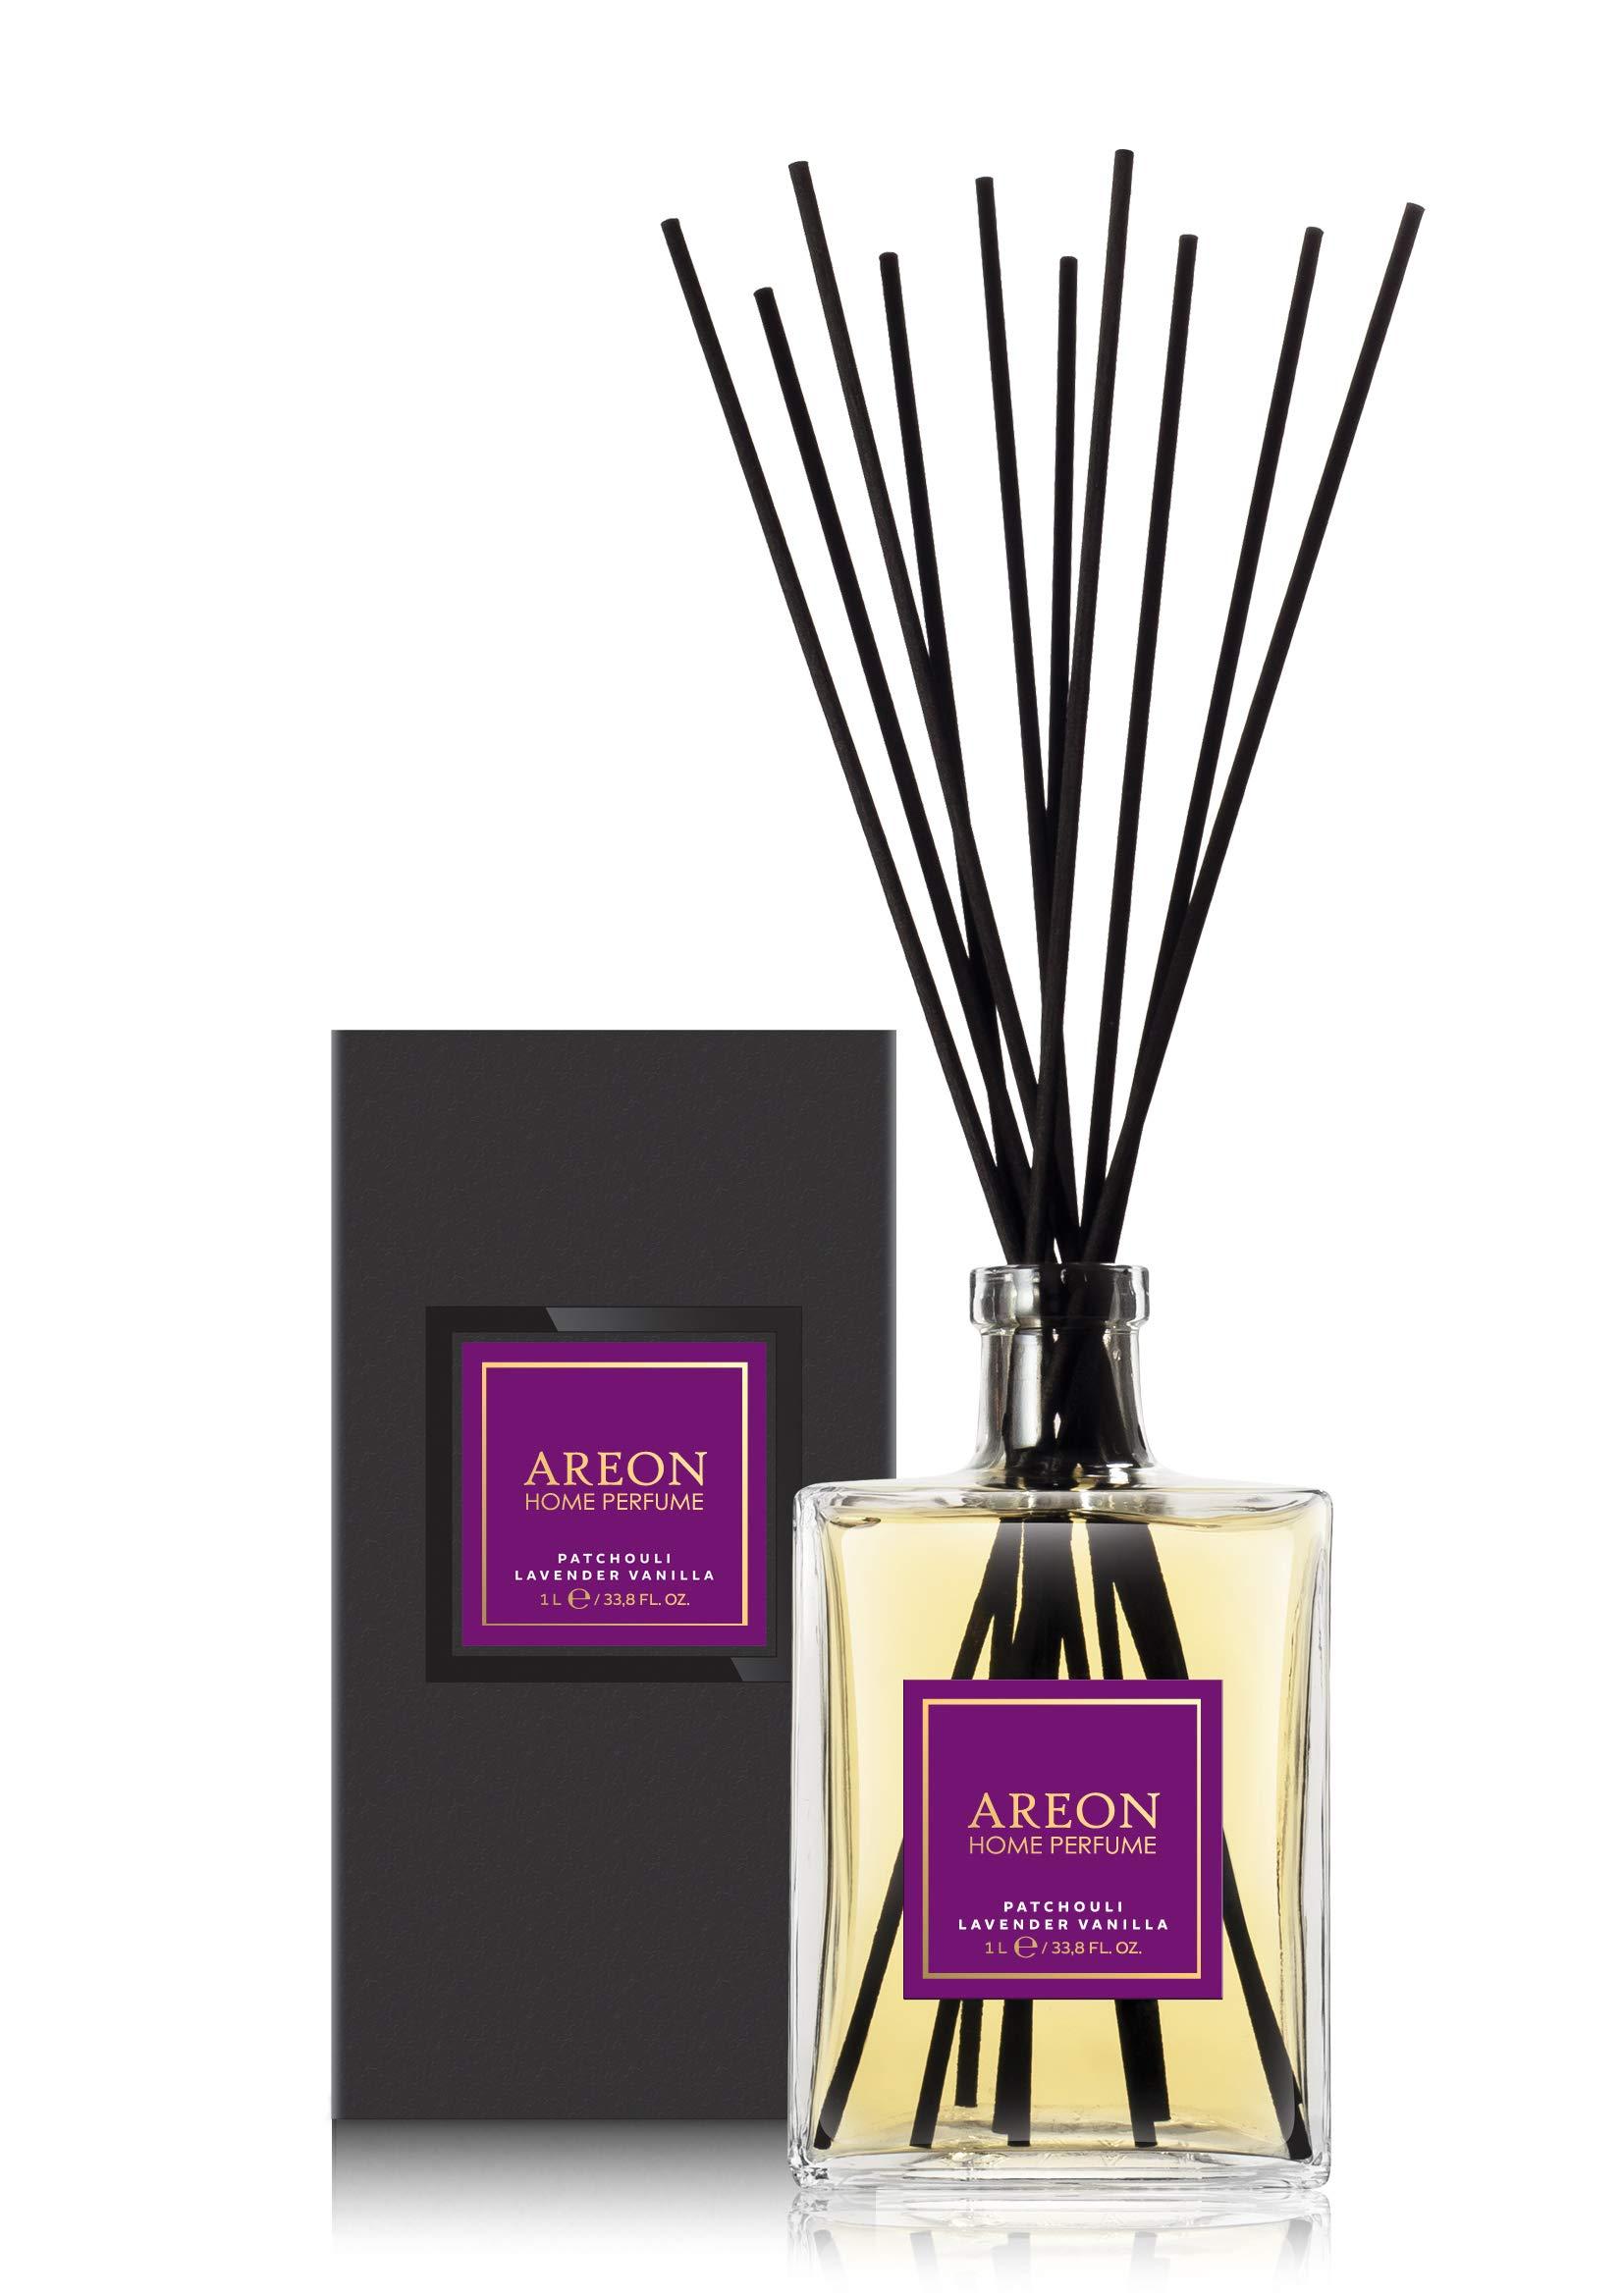 Areon Home Perfume Sticks - 1 Liter (34 OZ) Patchouli-Lavender-Vanilla